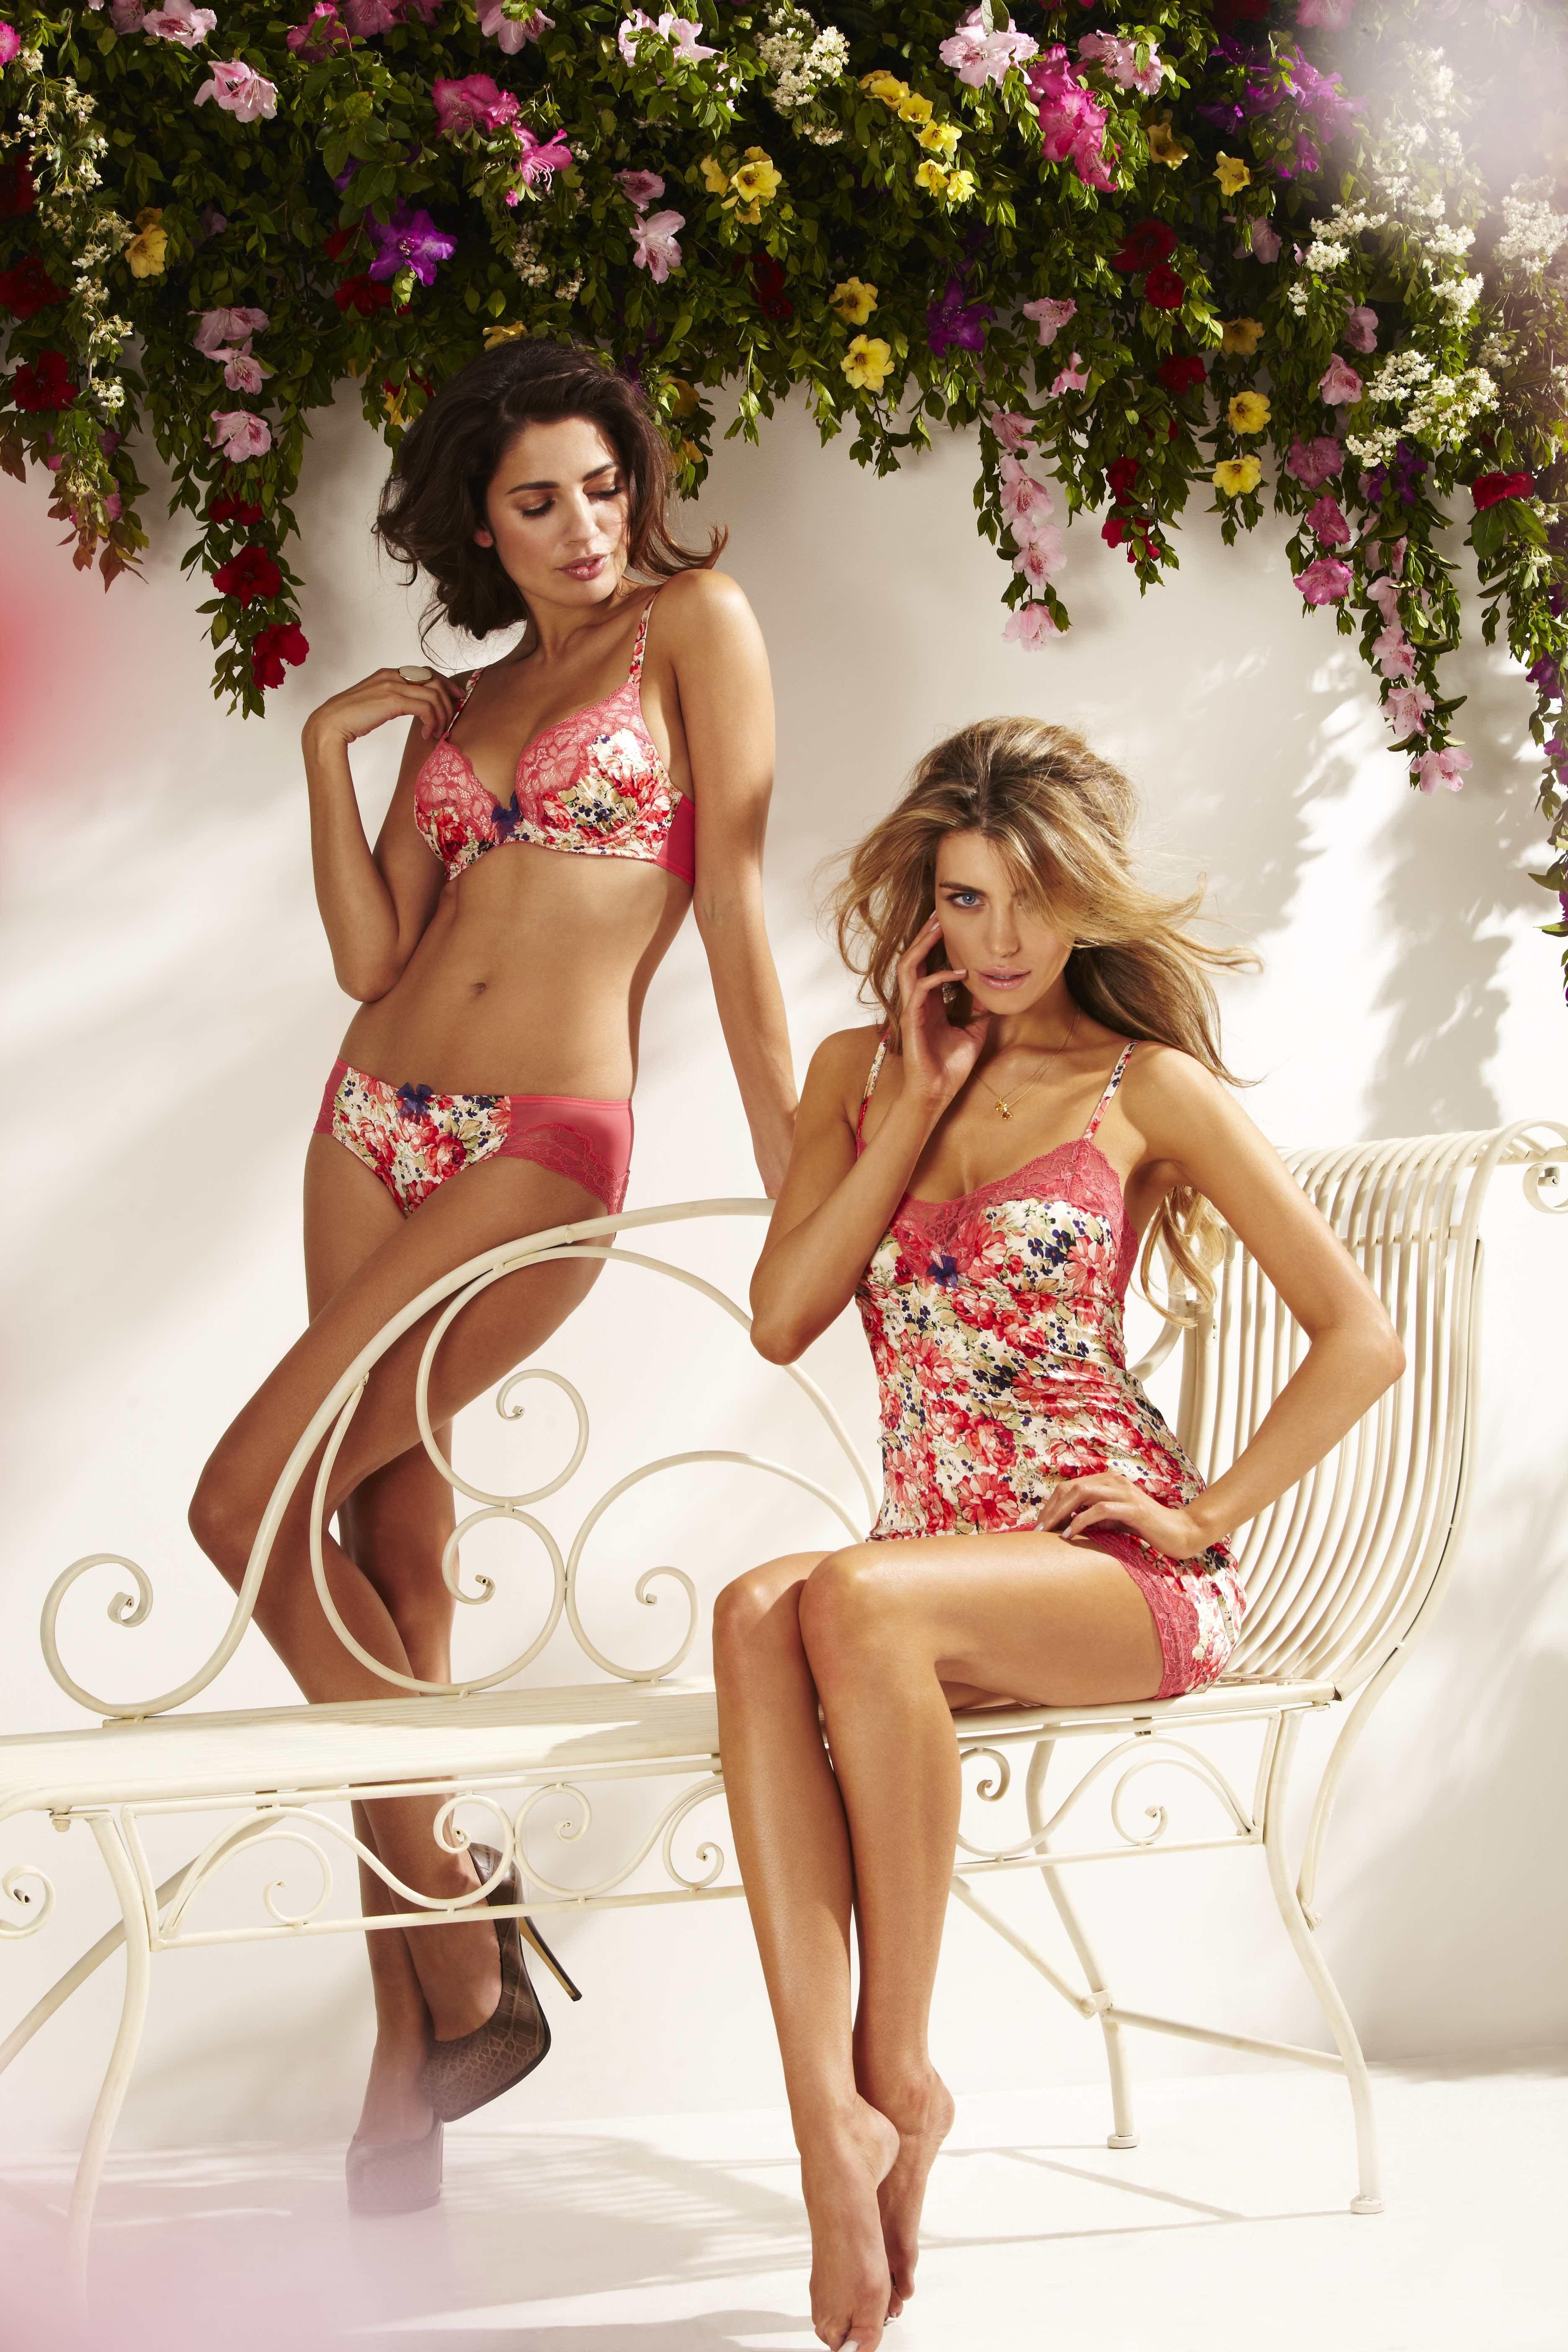 bca7bdb2ba1 Gossard Lingerie Spring Summer flower inspiration shoot with Elle Liberachi    Eva Smite. Photographer Ben Riggott